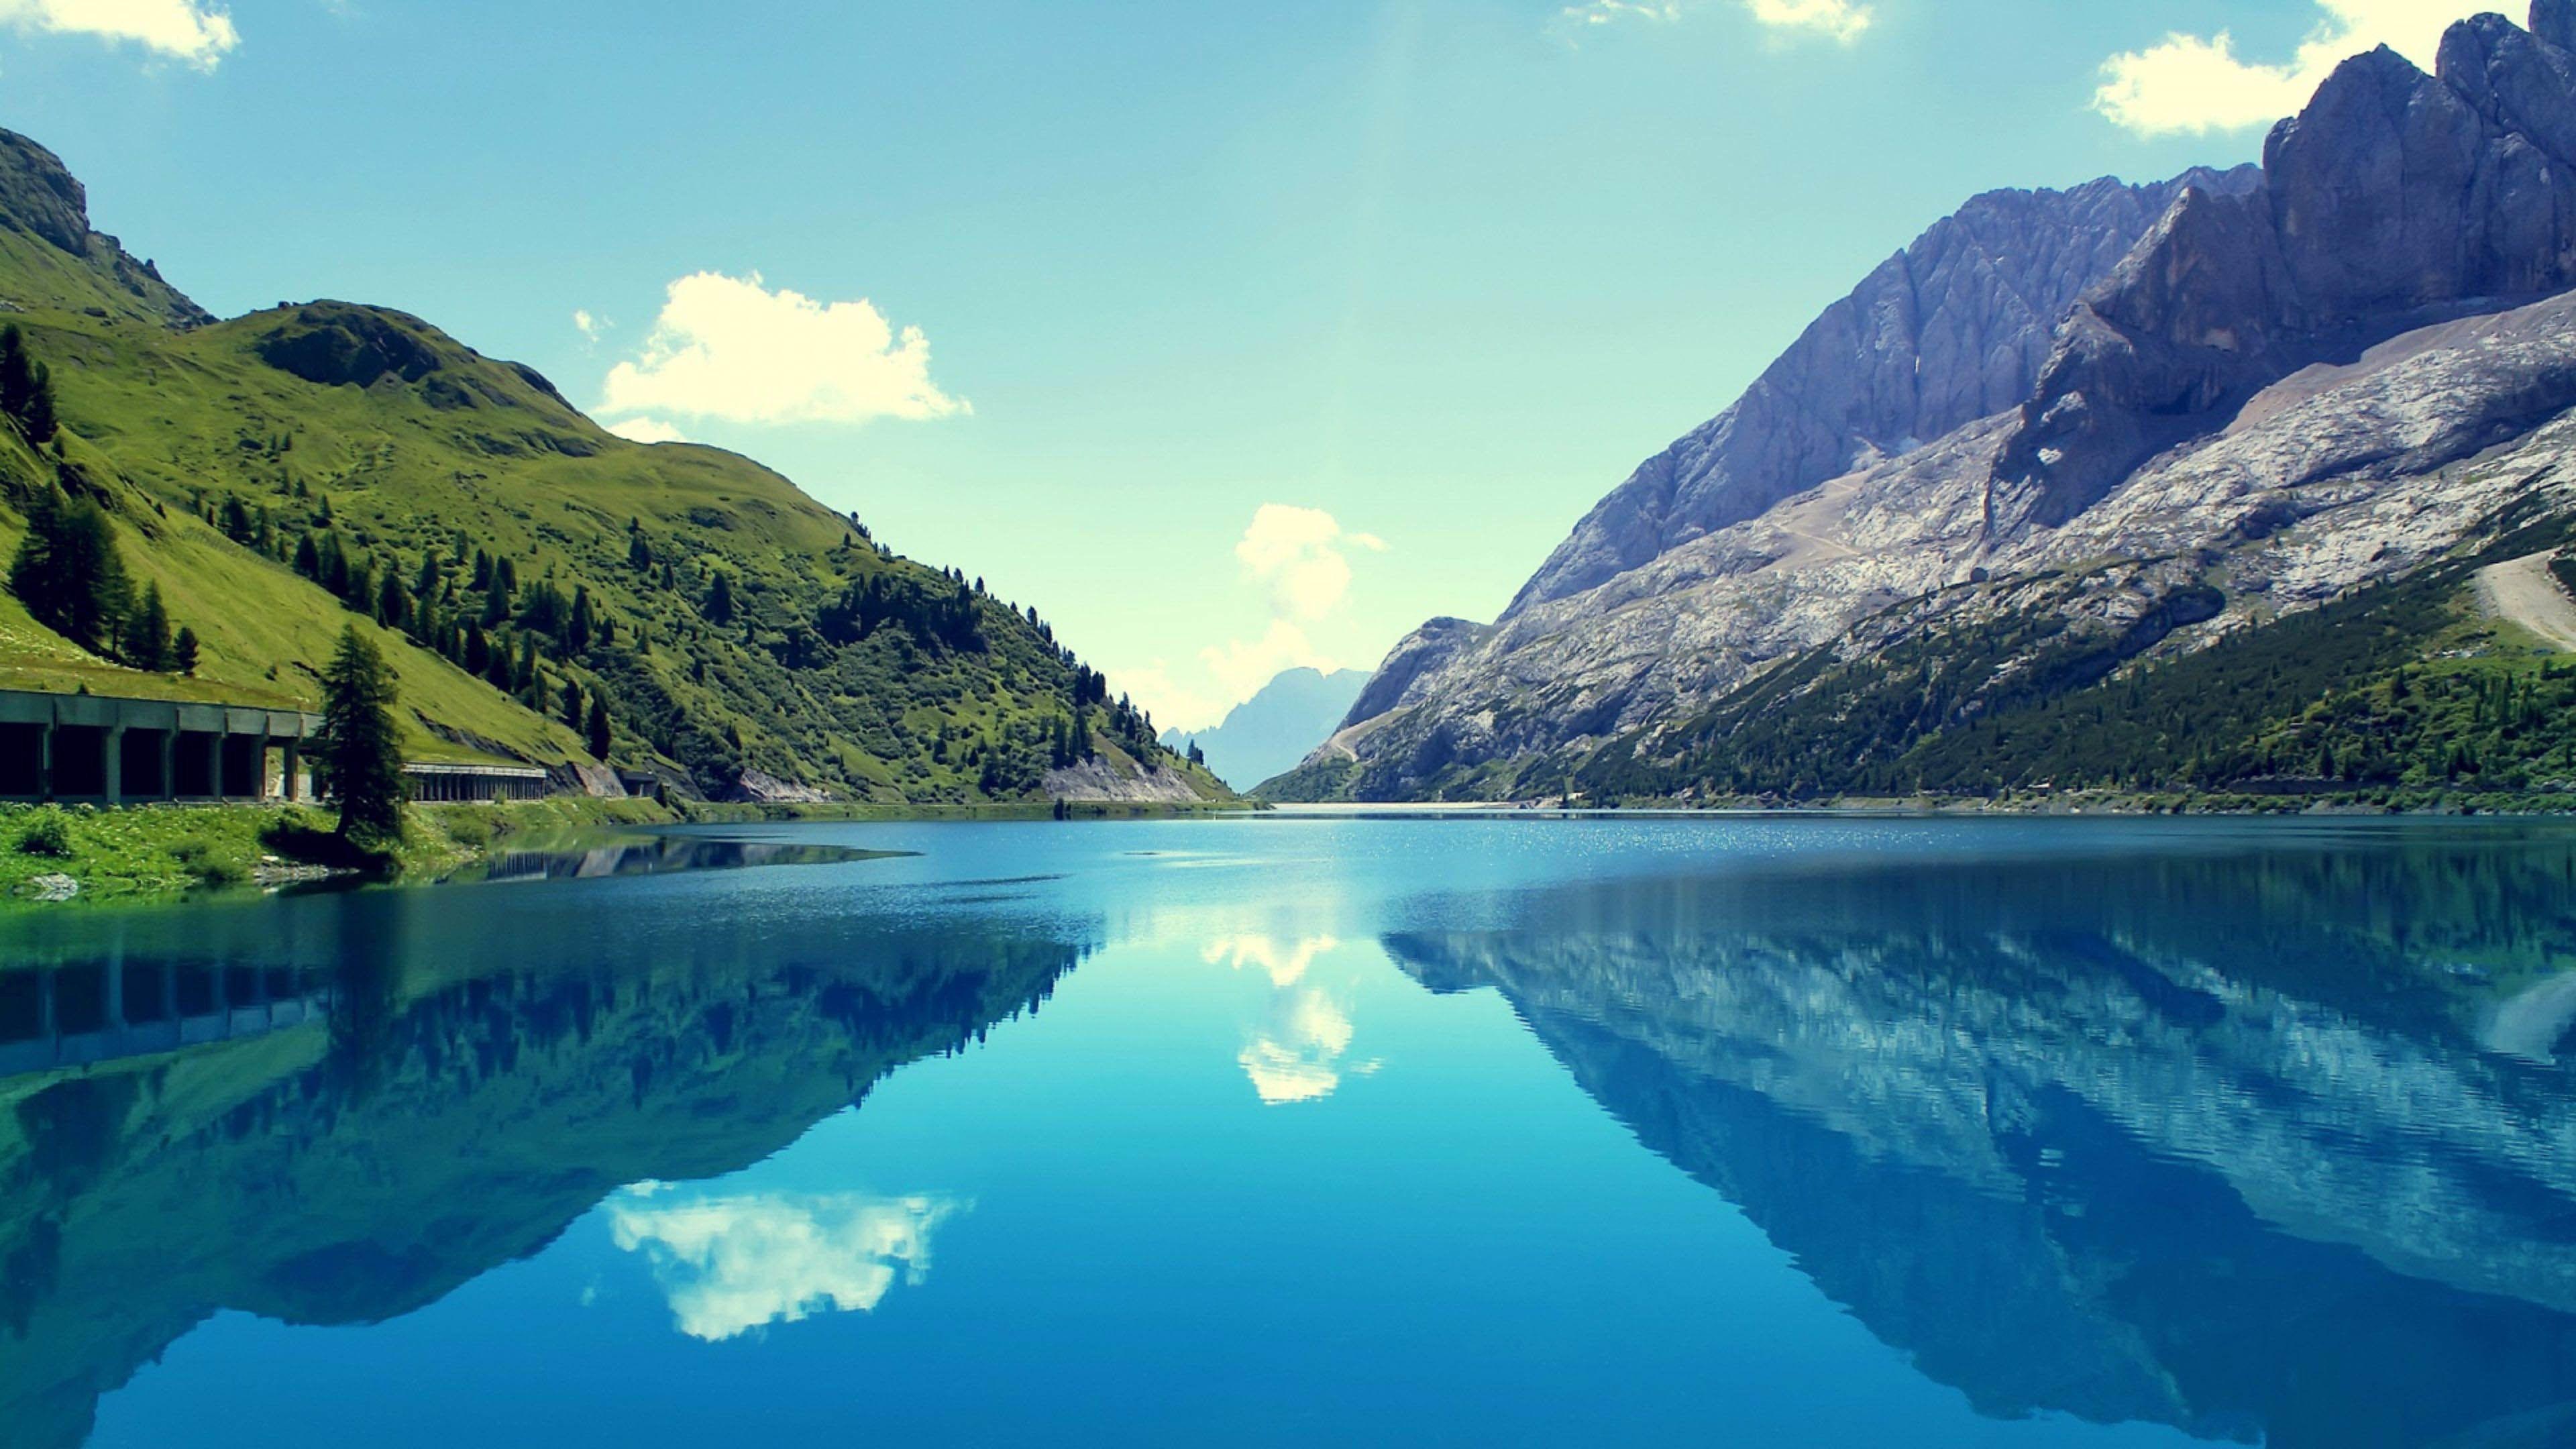 3d 4k Fbb Wallpaper 3840x2160 Nature 4k Beautiful Lake Landscape 3840x2160